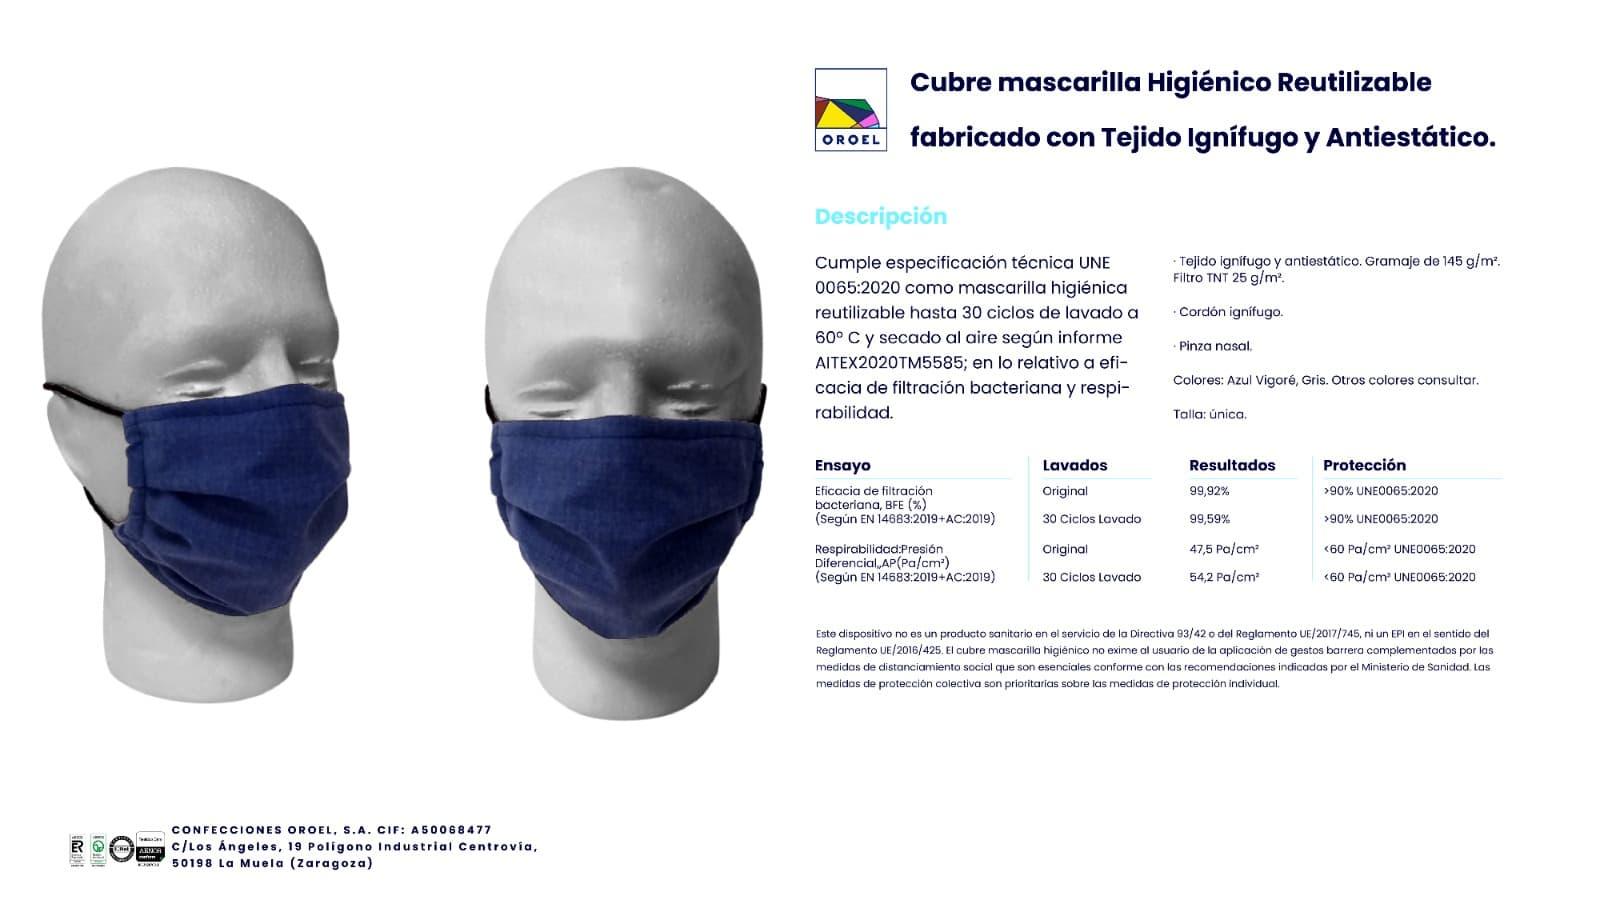 Cubre mascarillas higienico reutilizable